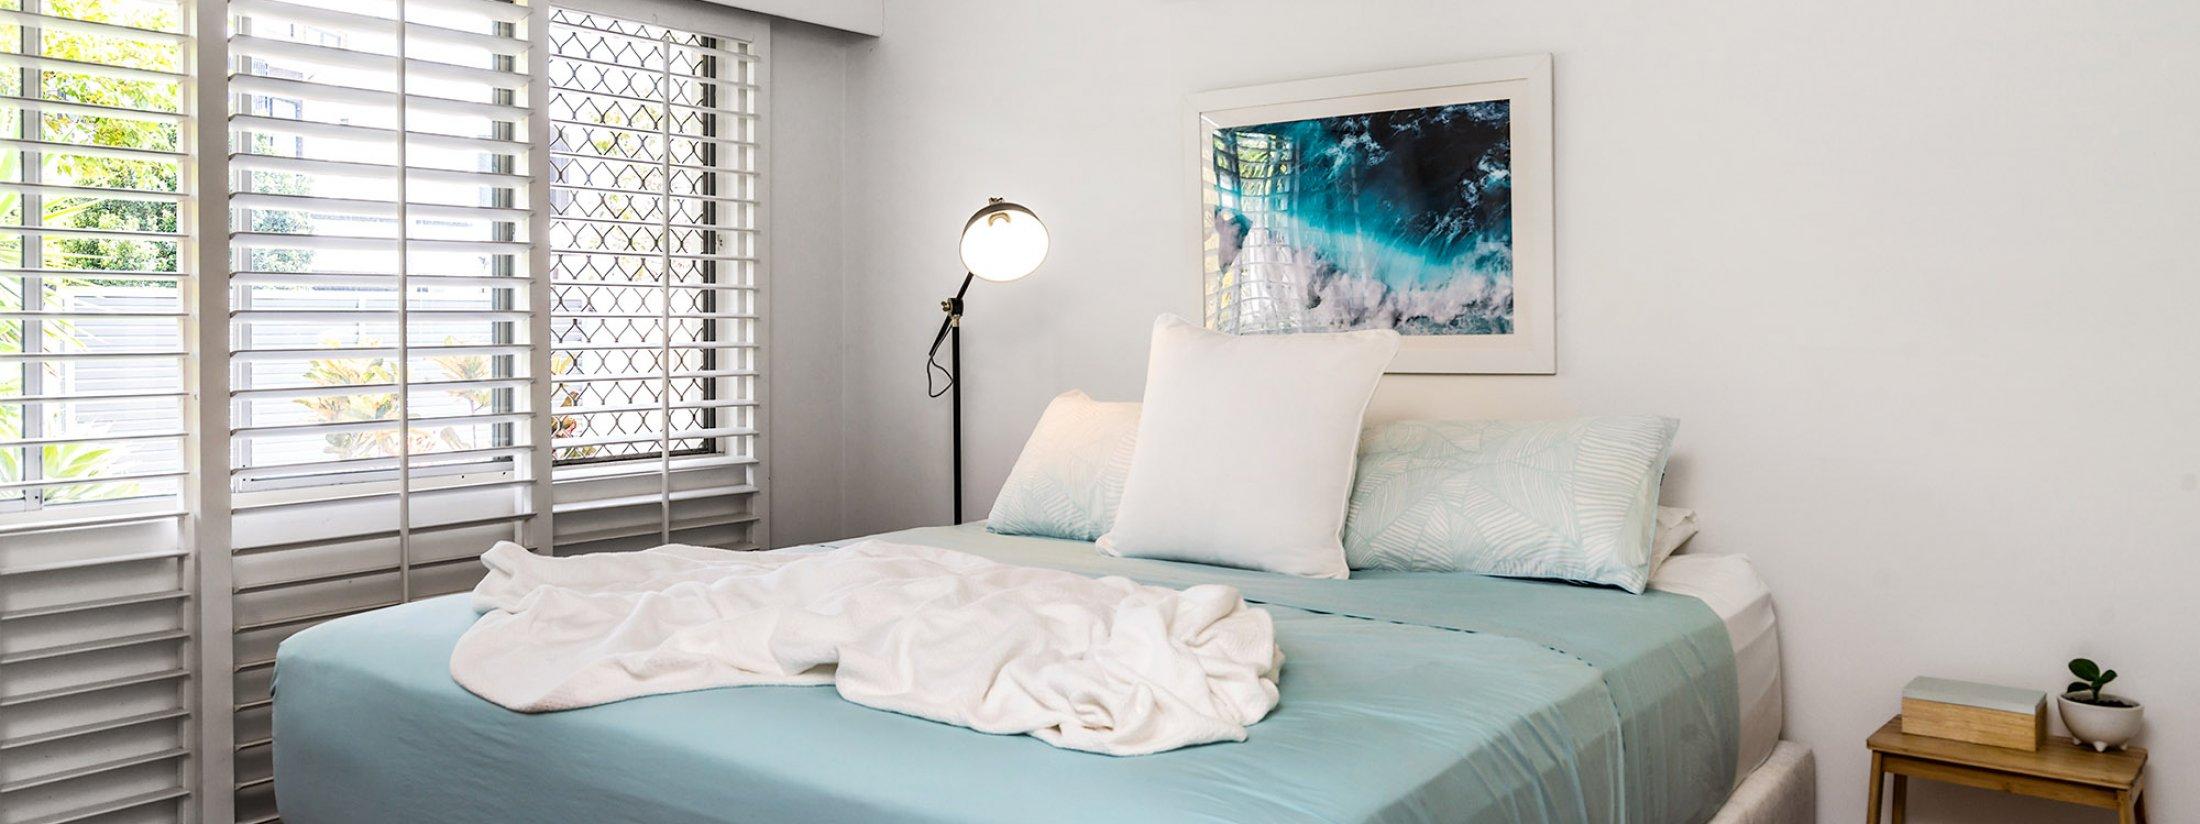 Pacifica - Broadbeach Waters - Master Bedroom